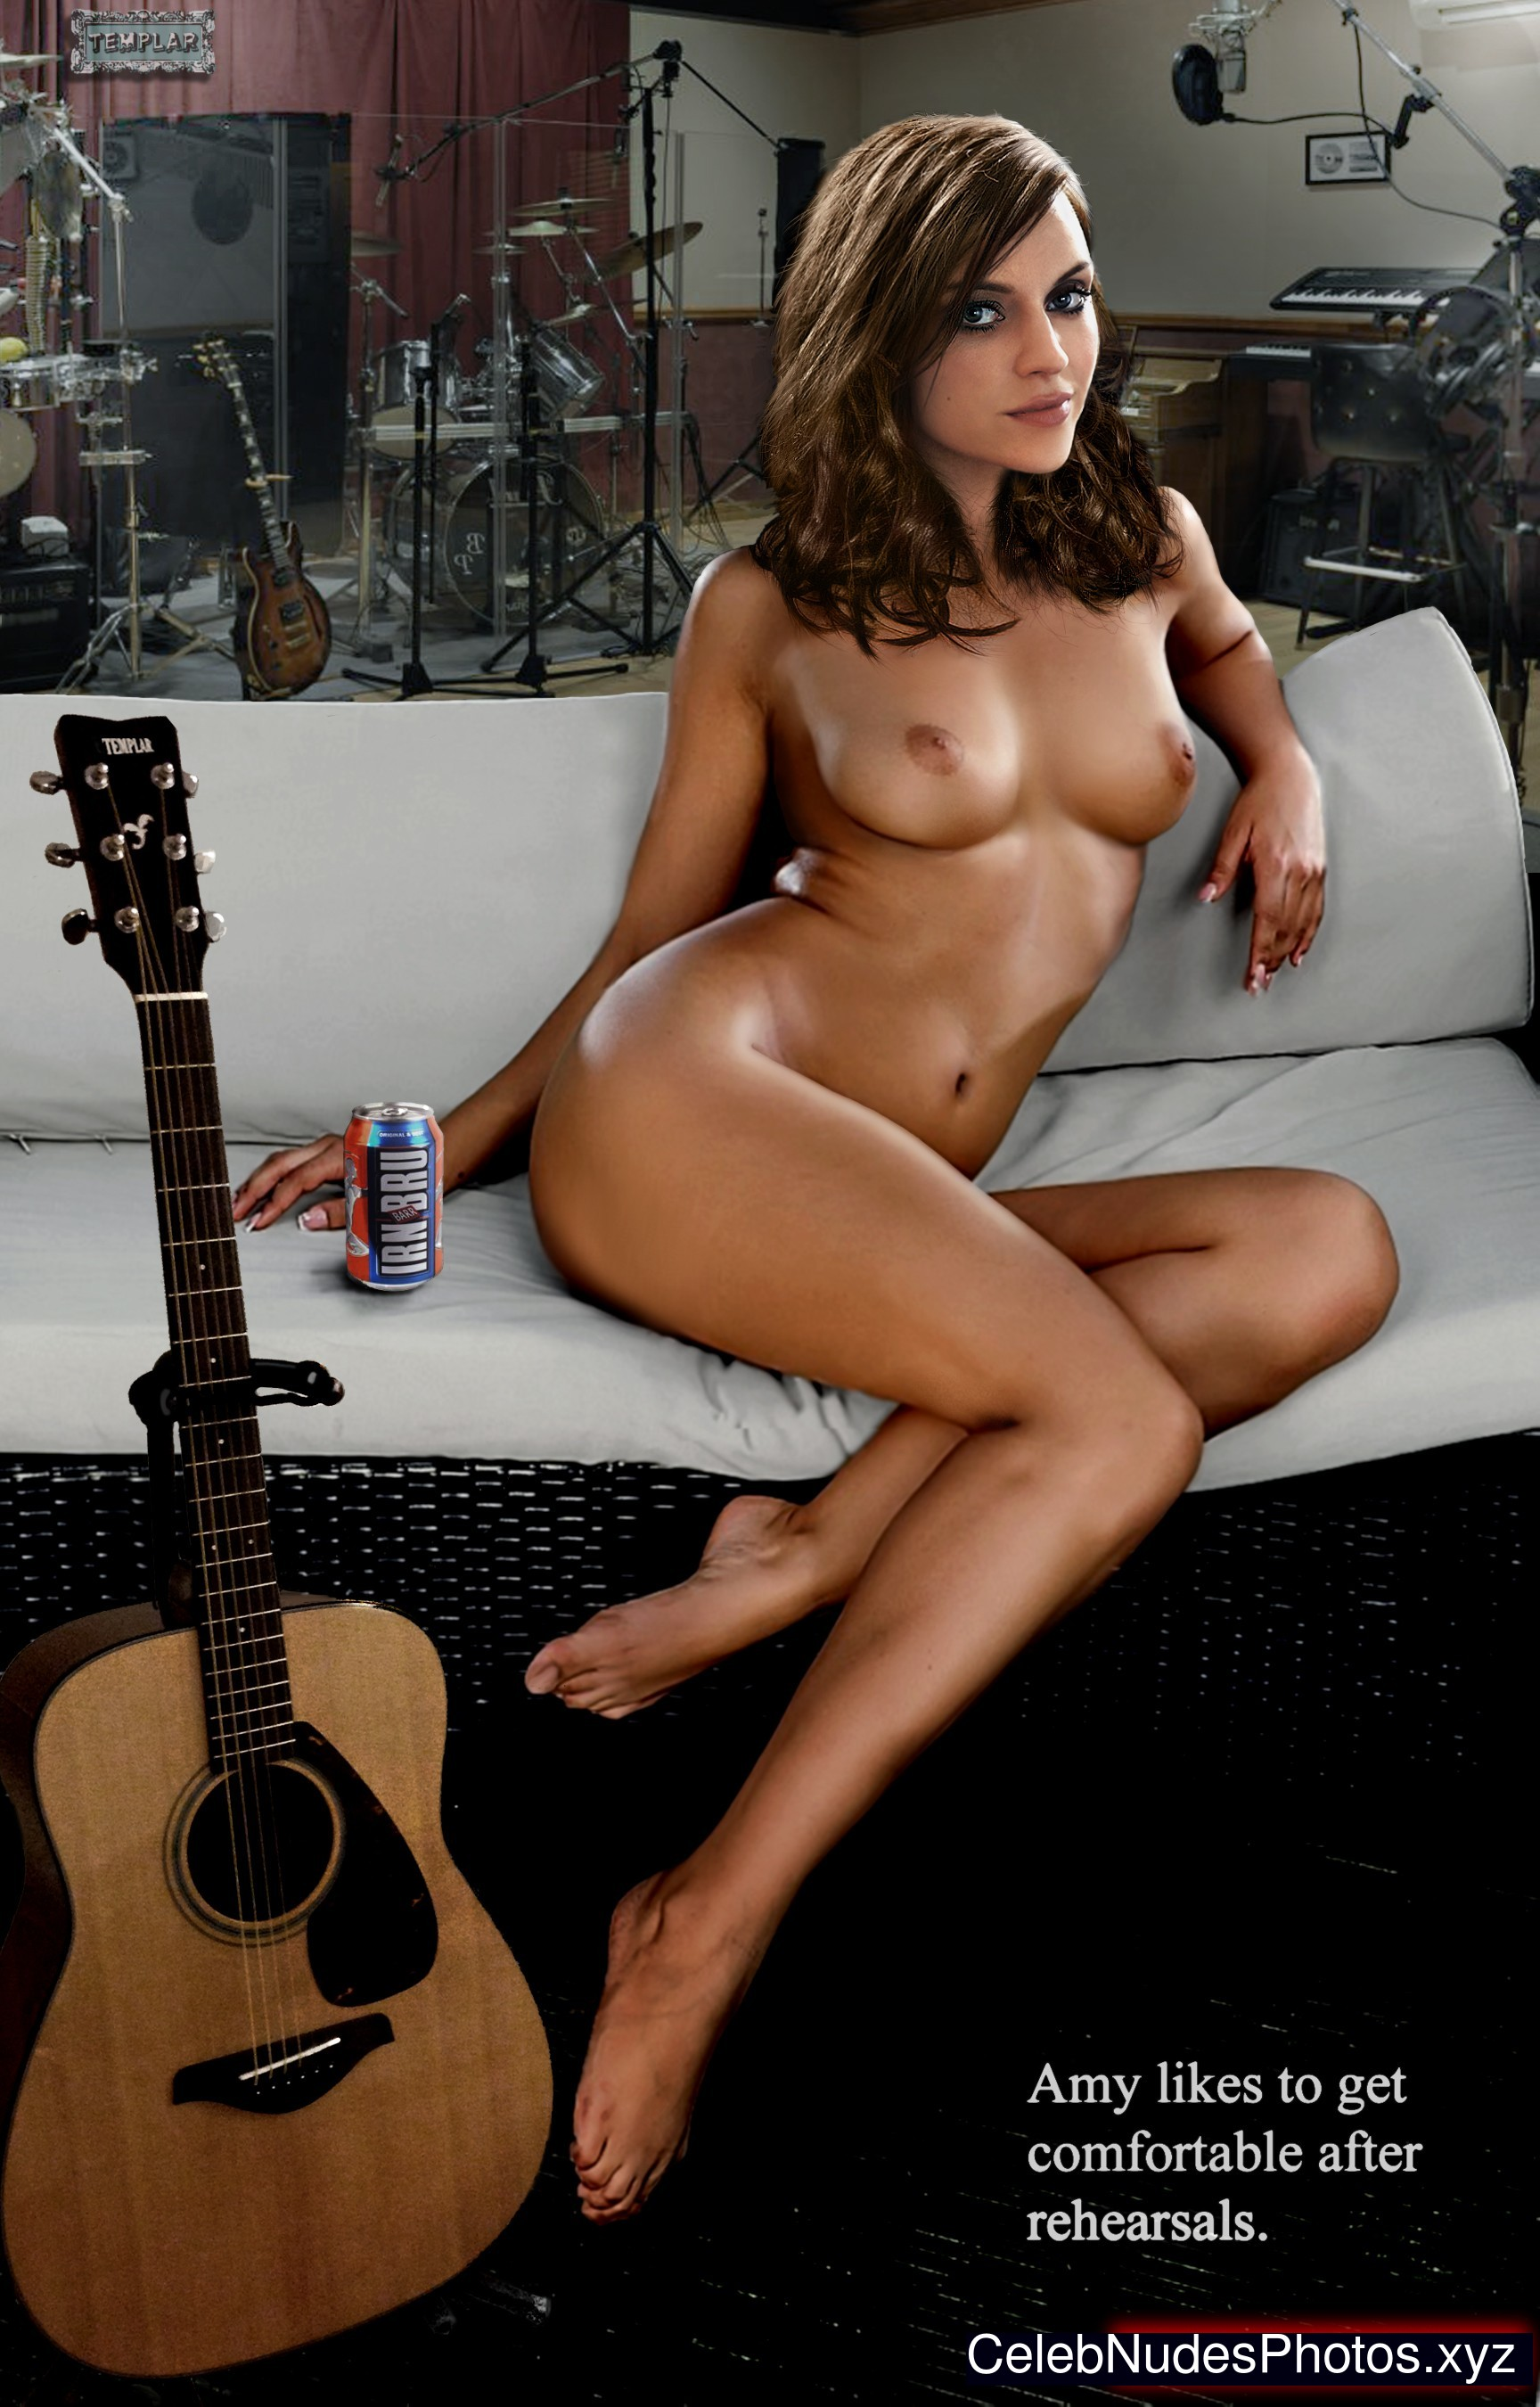 Amy Macdonald celeb nude